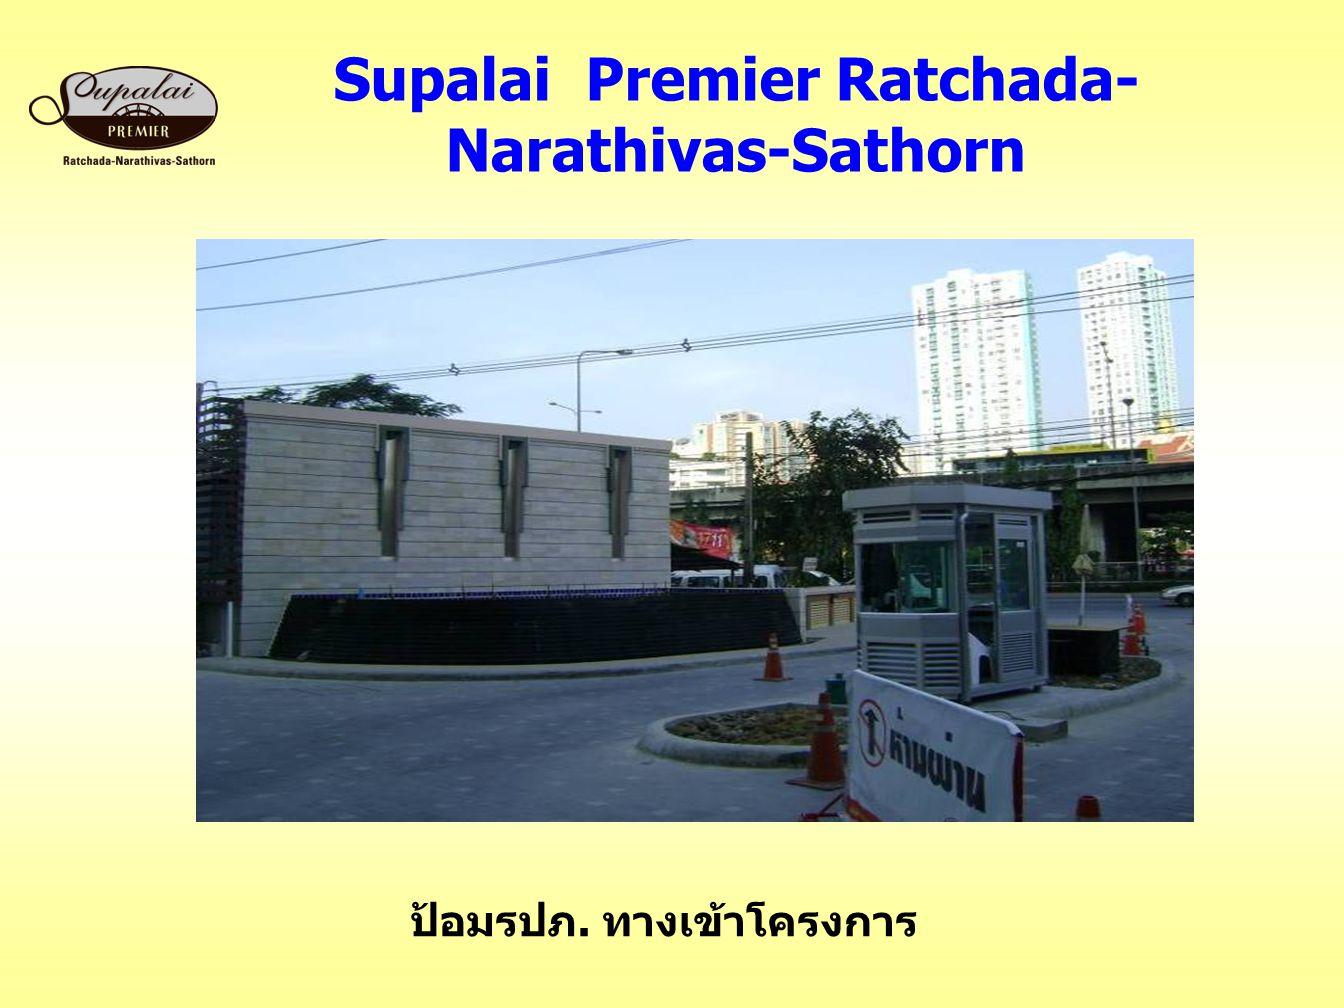 Supalai Premier Ratchada- Narathivas-Sathorn ป้อมรปภ. ทางเข้าโครงการ